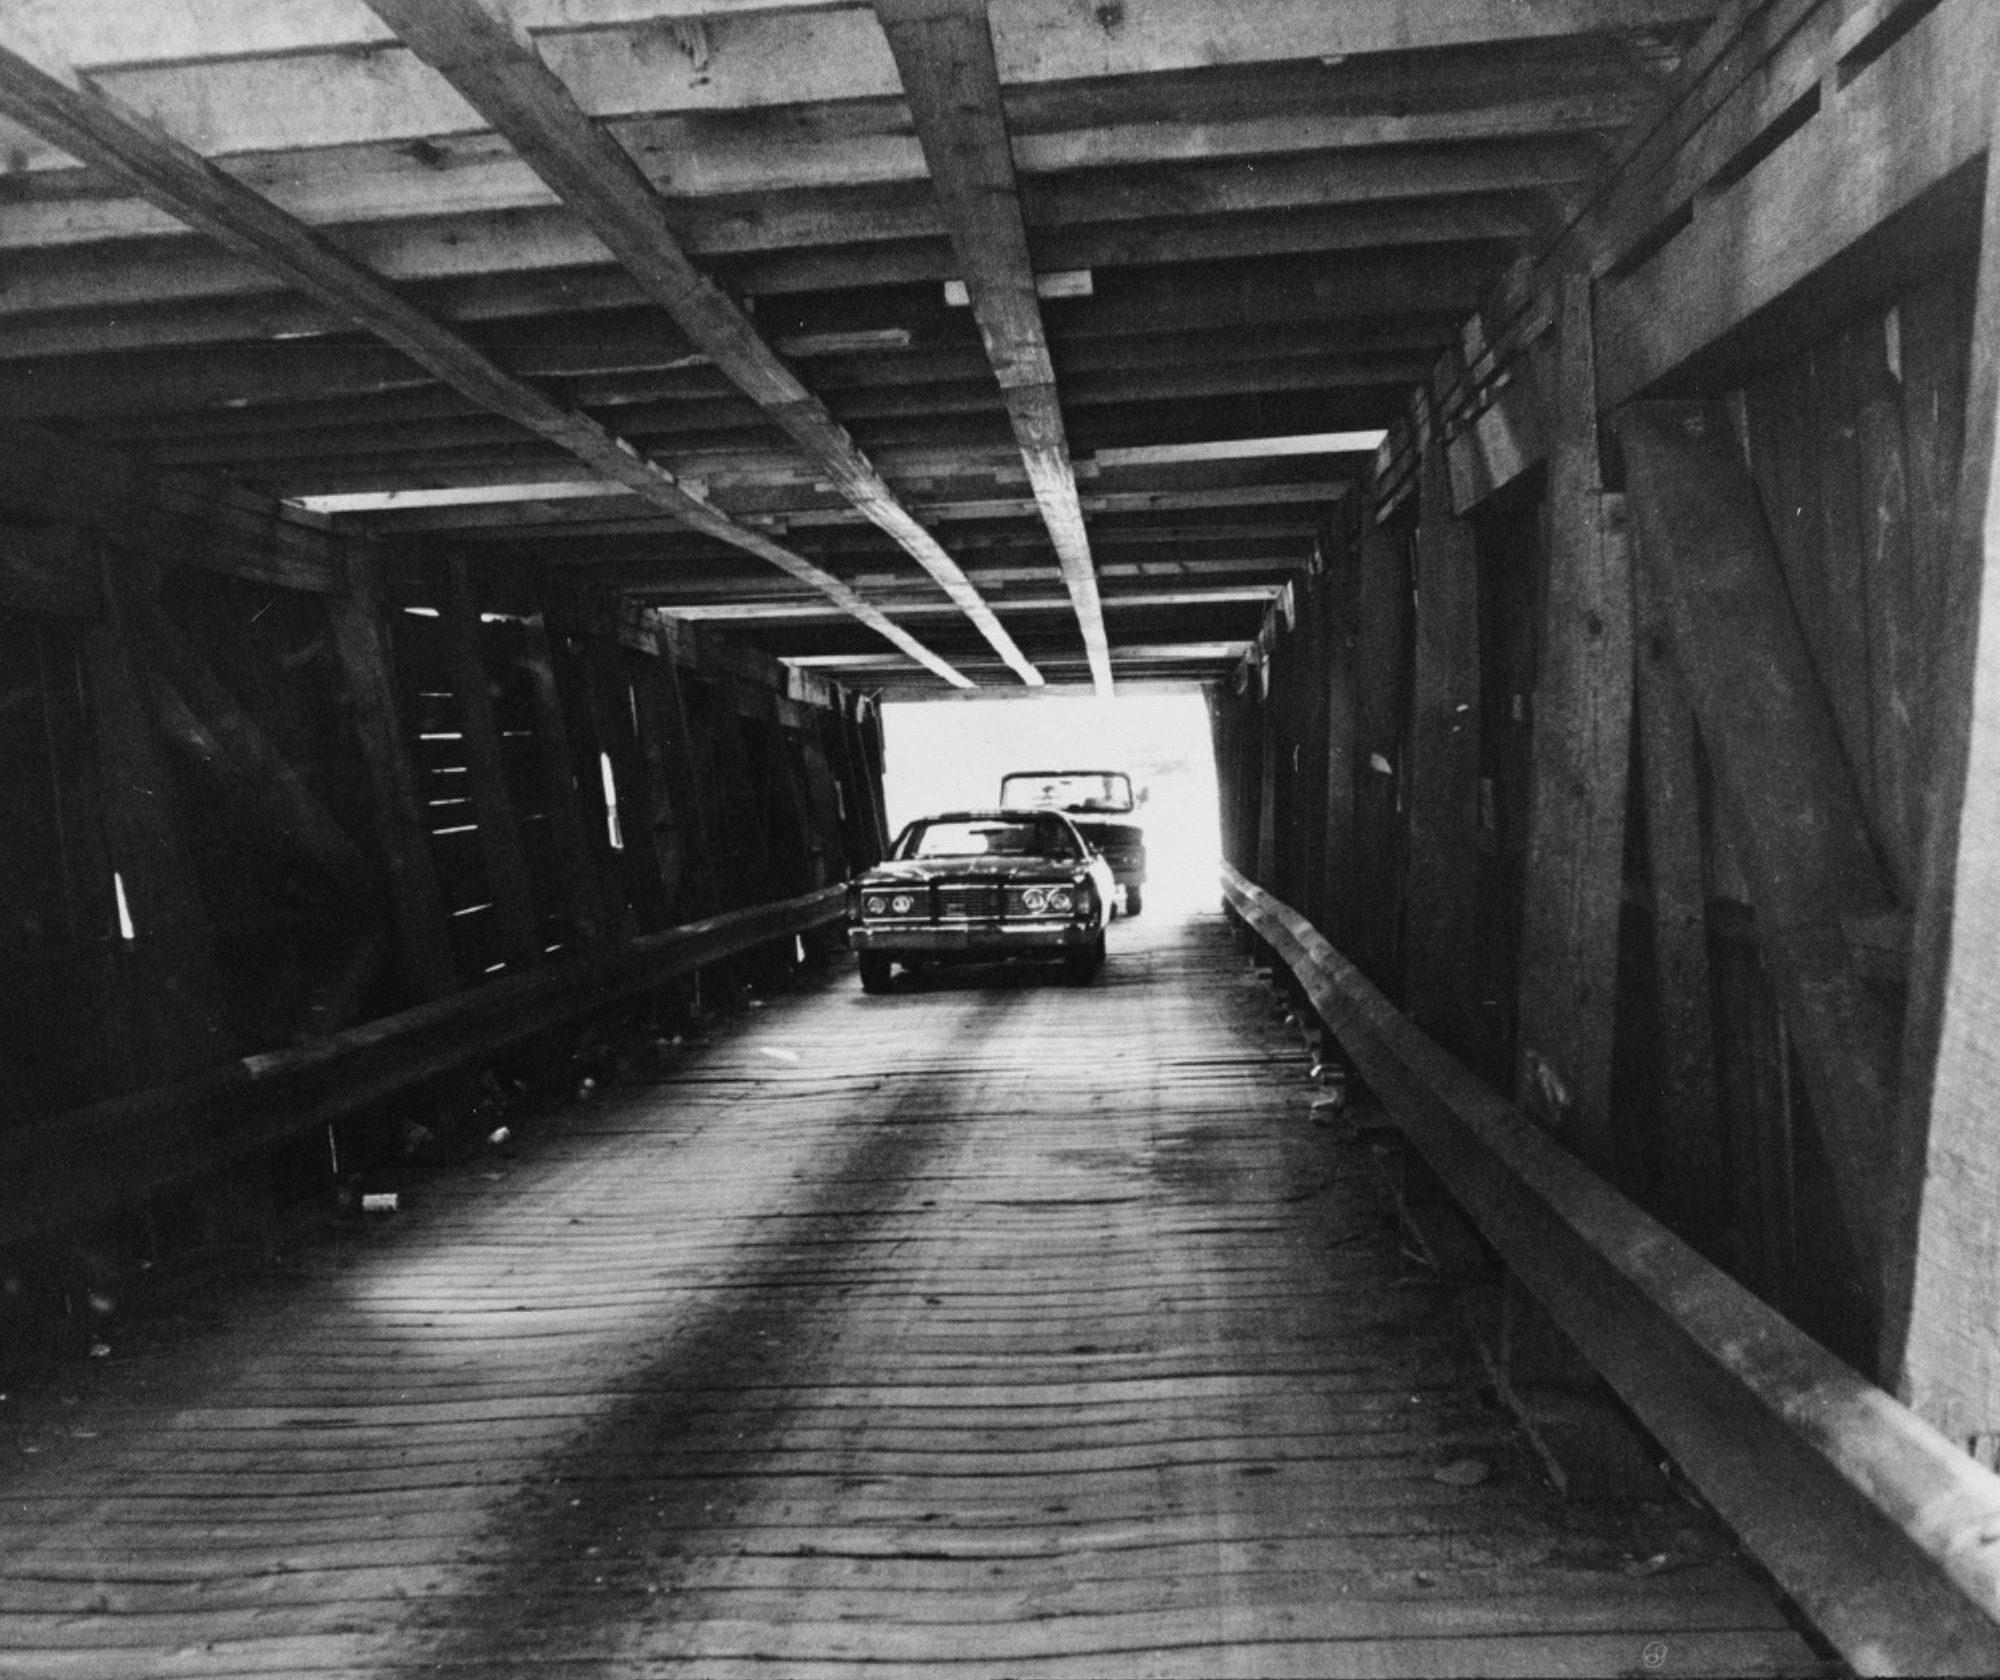 The Covered Bridge – Concord Covered Bridge Historic District